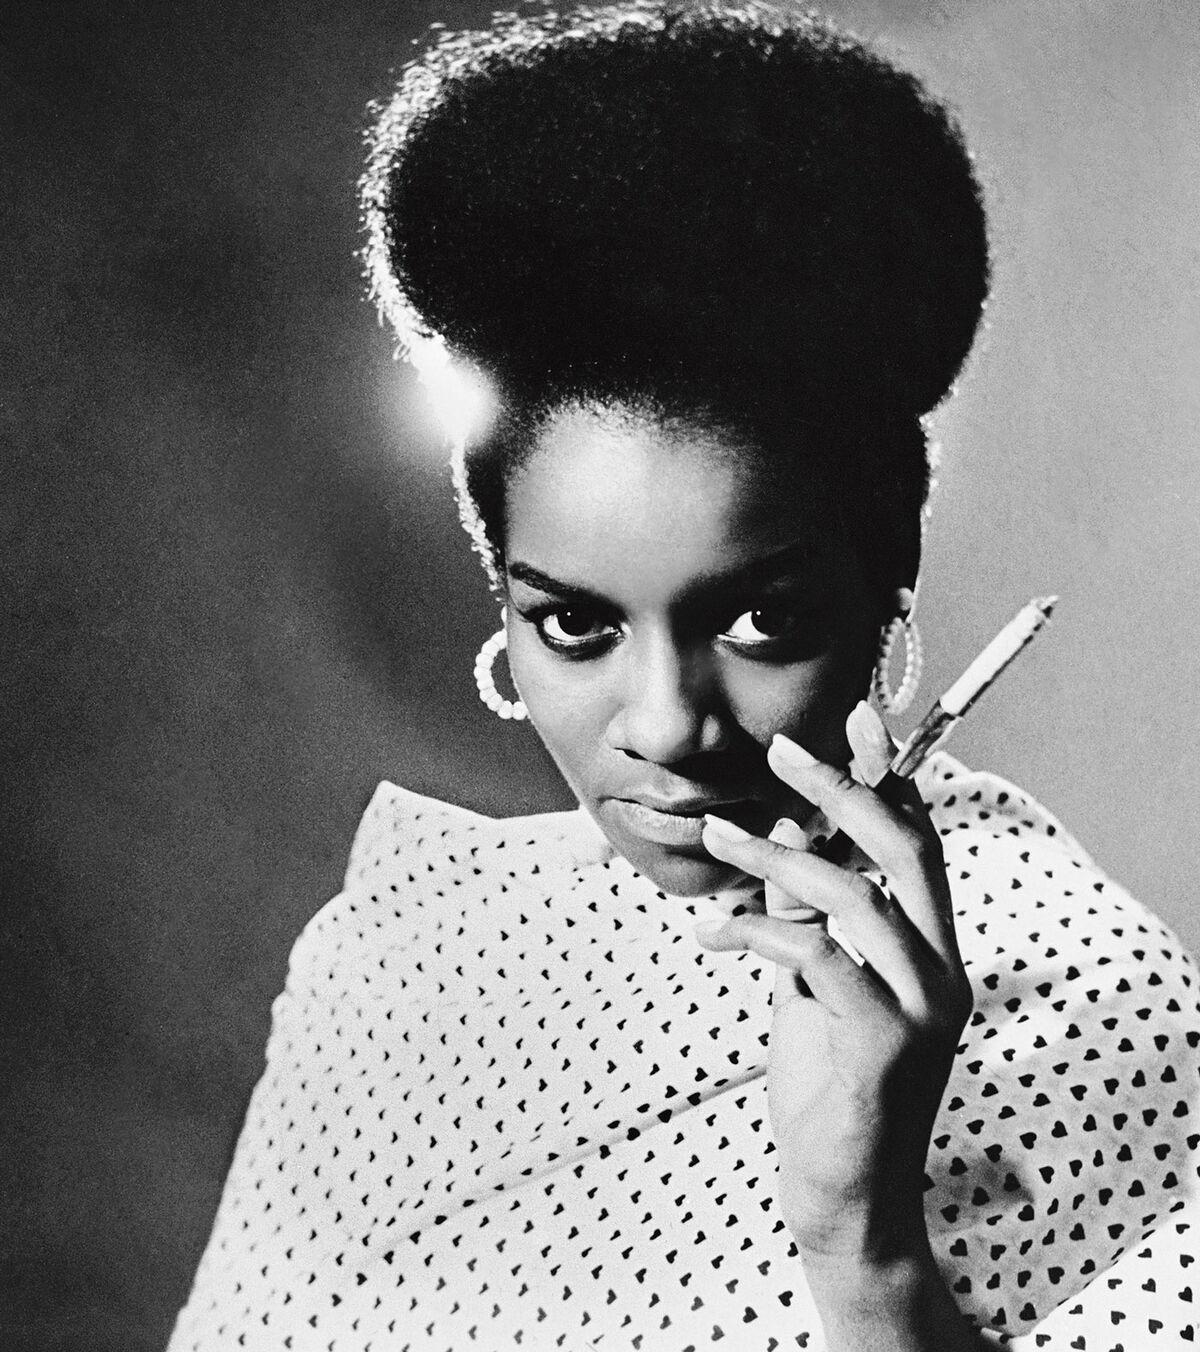 Kwame Brathwaite, Priscilla Bardonille, African Jazz-Art Society & Studios (AJASS), Harlem, ca. 1962, from Kwame Brathwaite: Black Is Beautiful, Aperture, 2019. © Kwame Brathwaite.